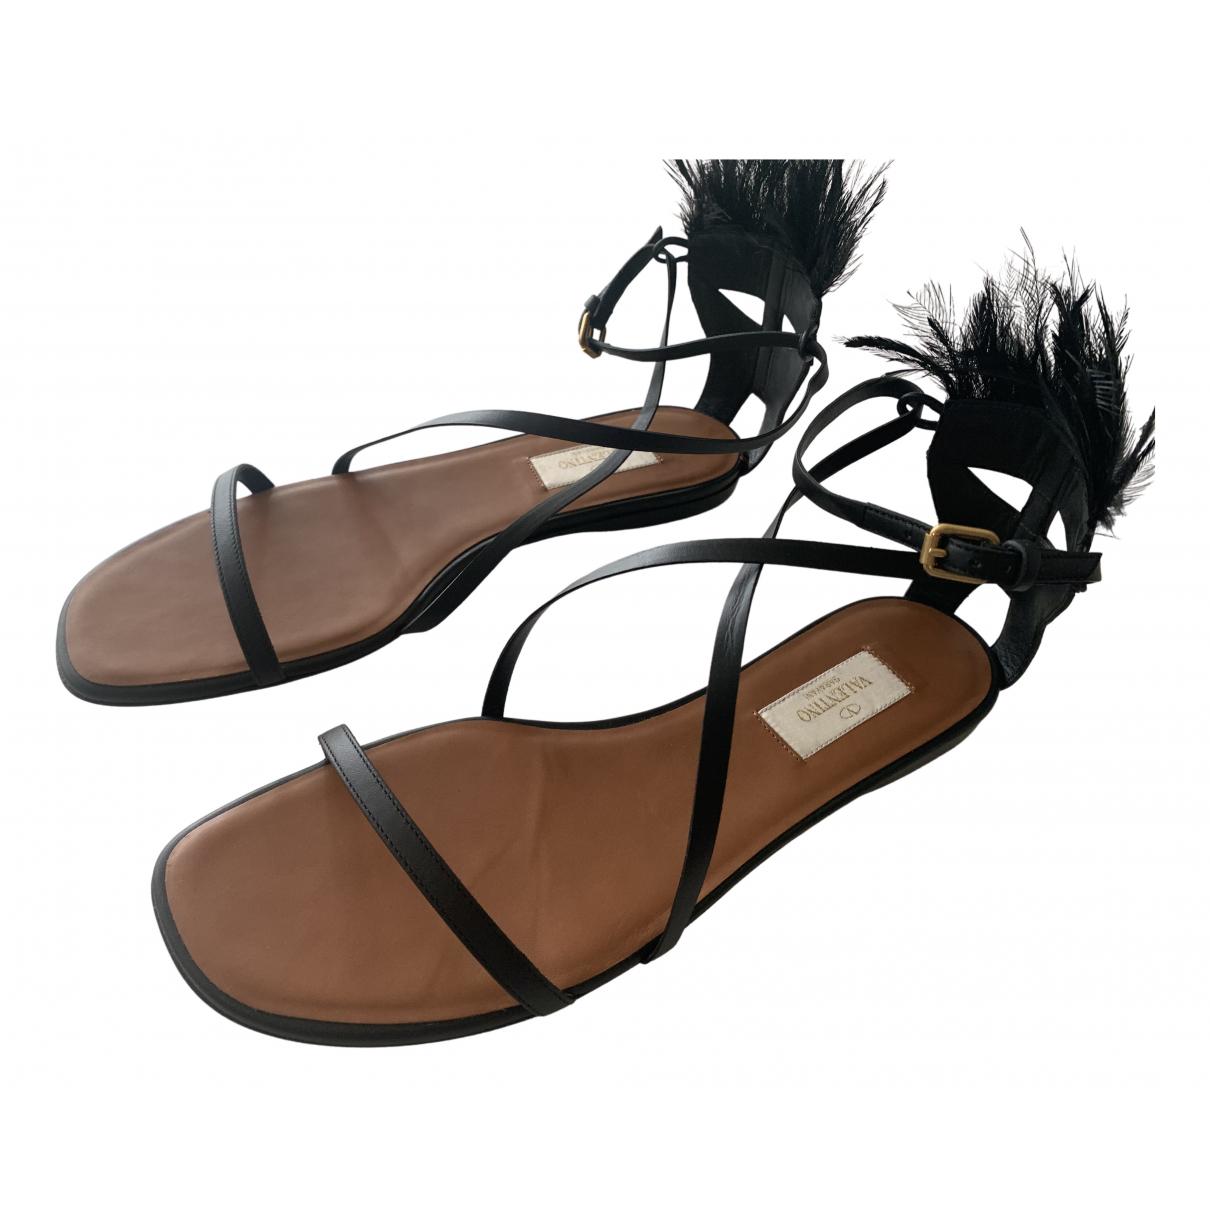 Valentino Garavani N Black Leather Sandals for Women 40 EU